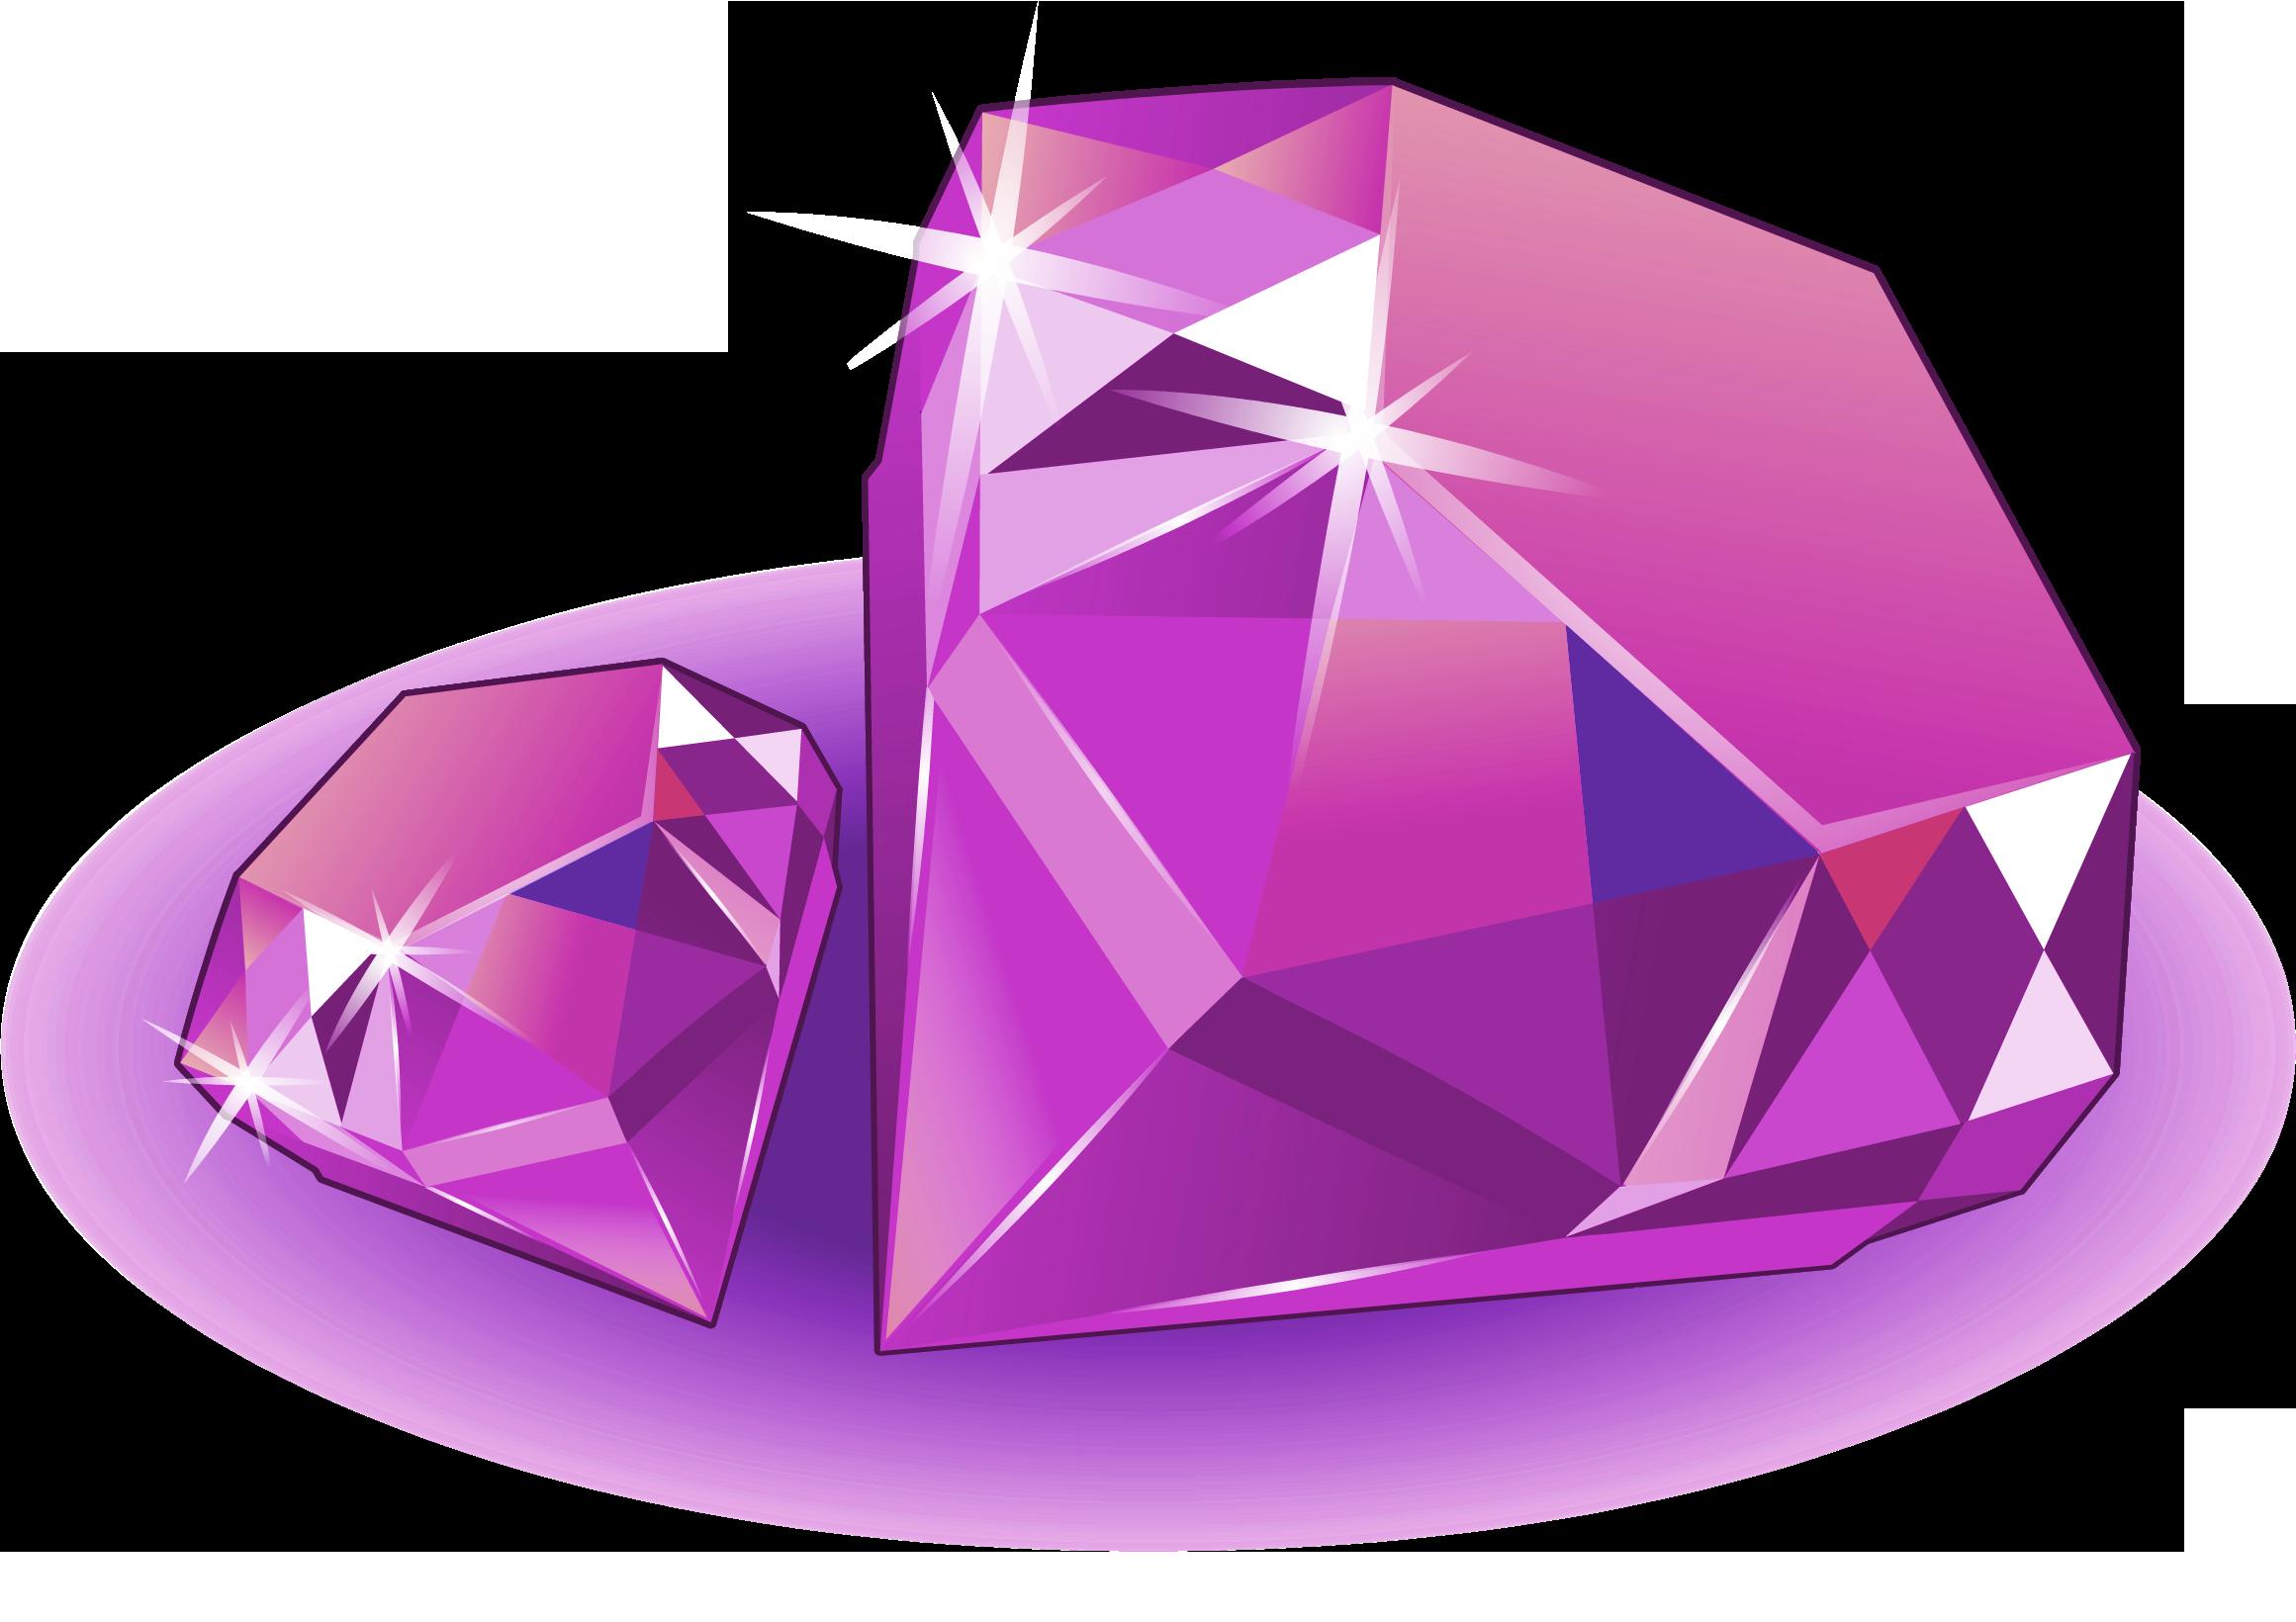 Diamonds clipart purple. Computer icons avatar clip